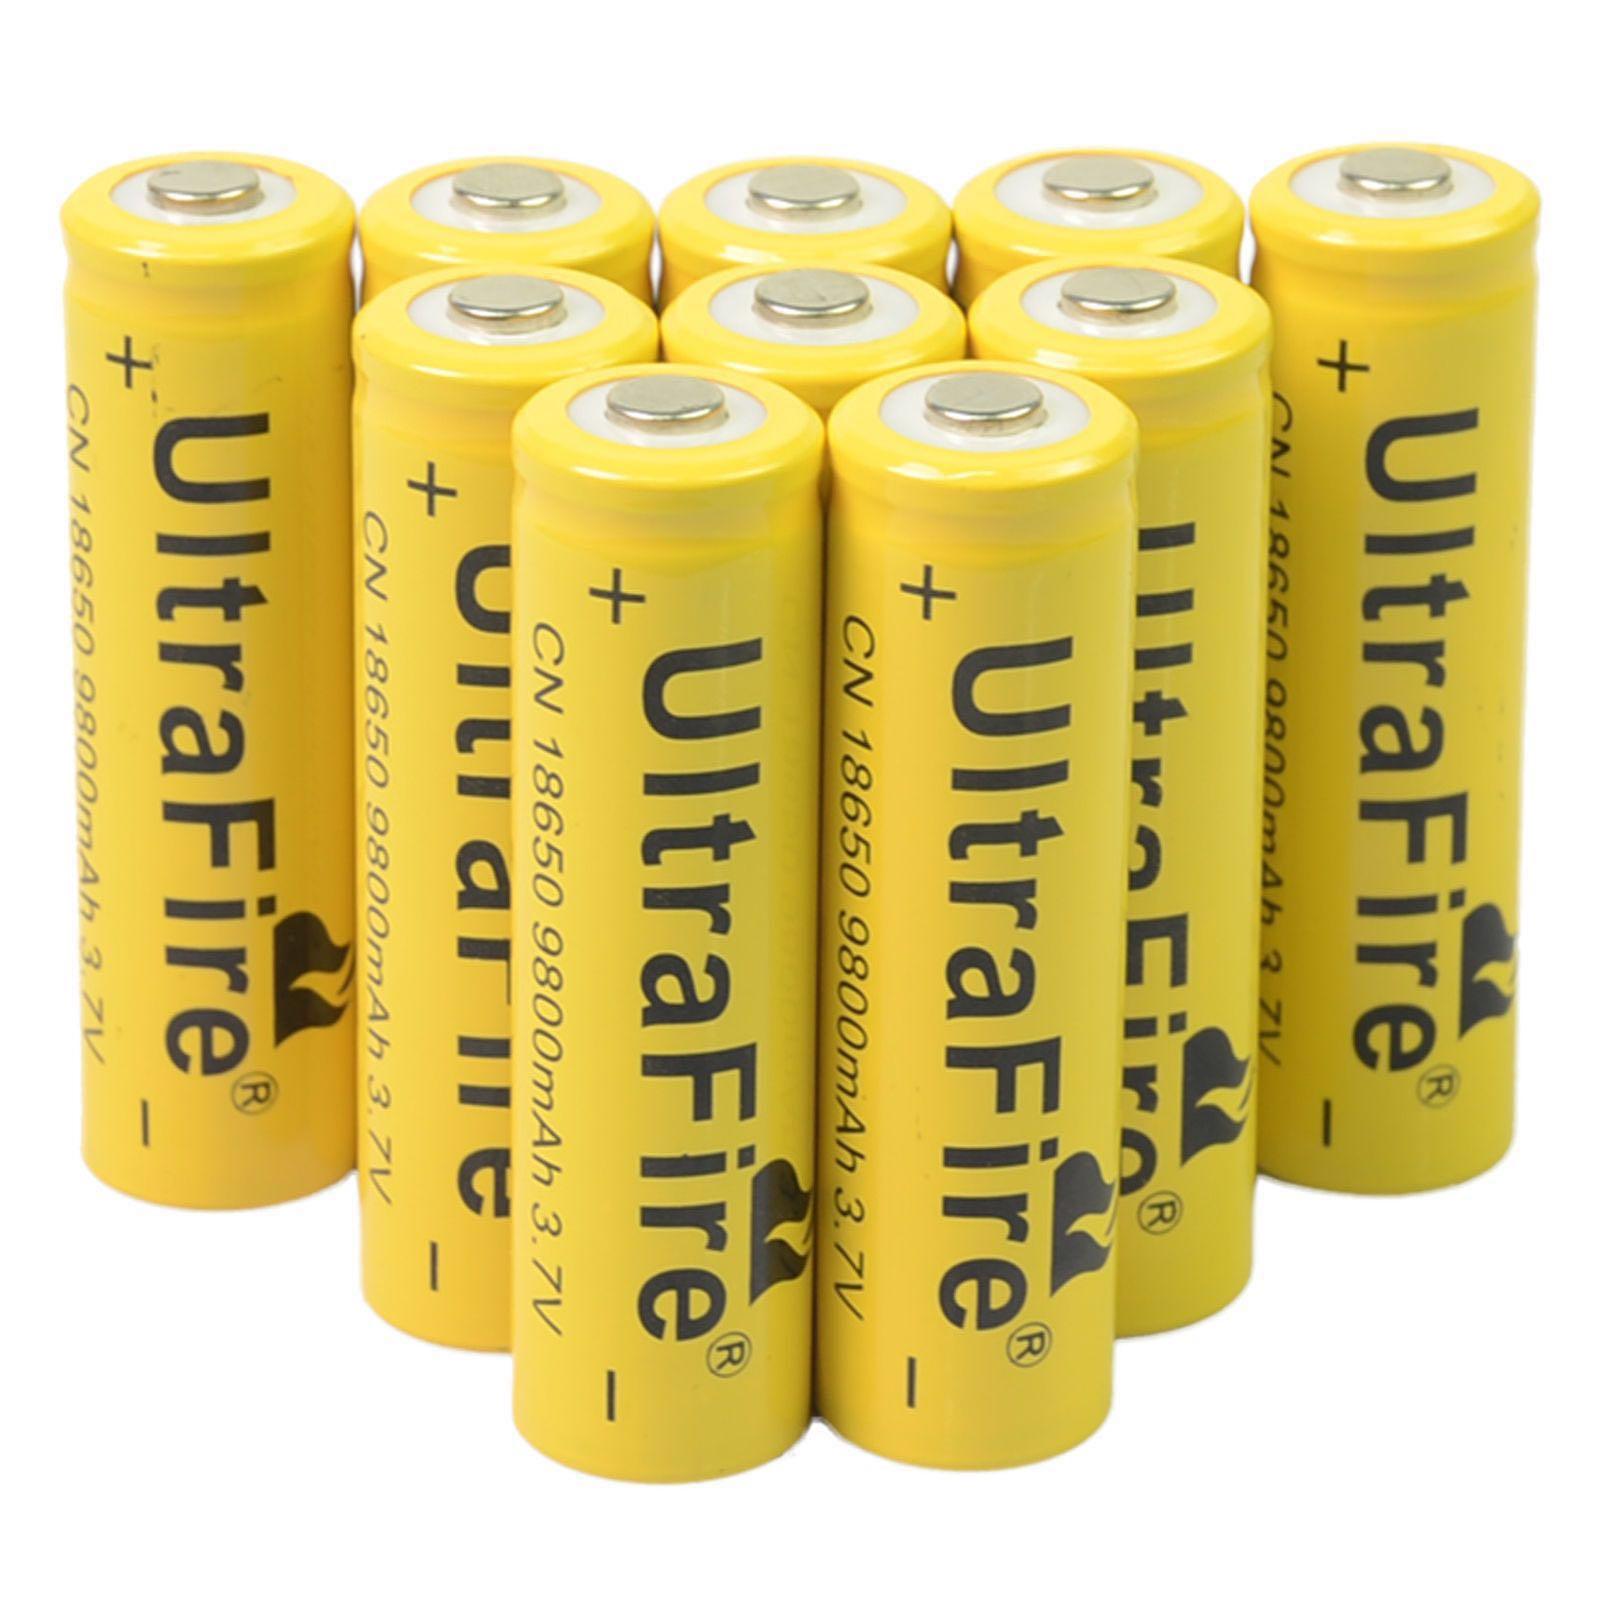 3 7V 18650 UltraFire 9800mAh Li-ion Rechargeable Battery For